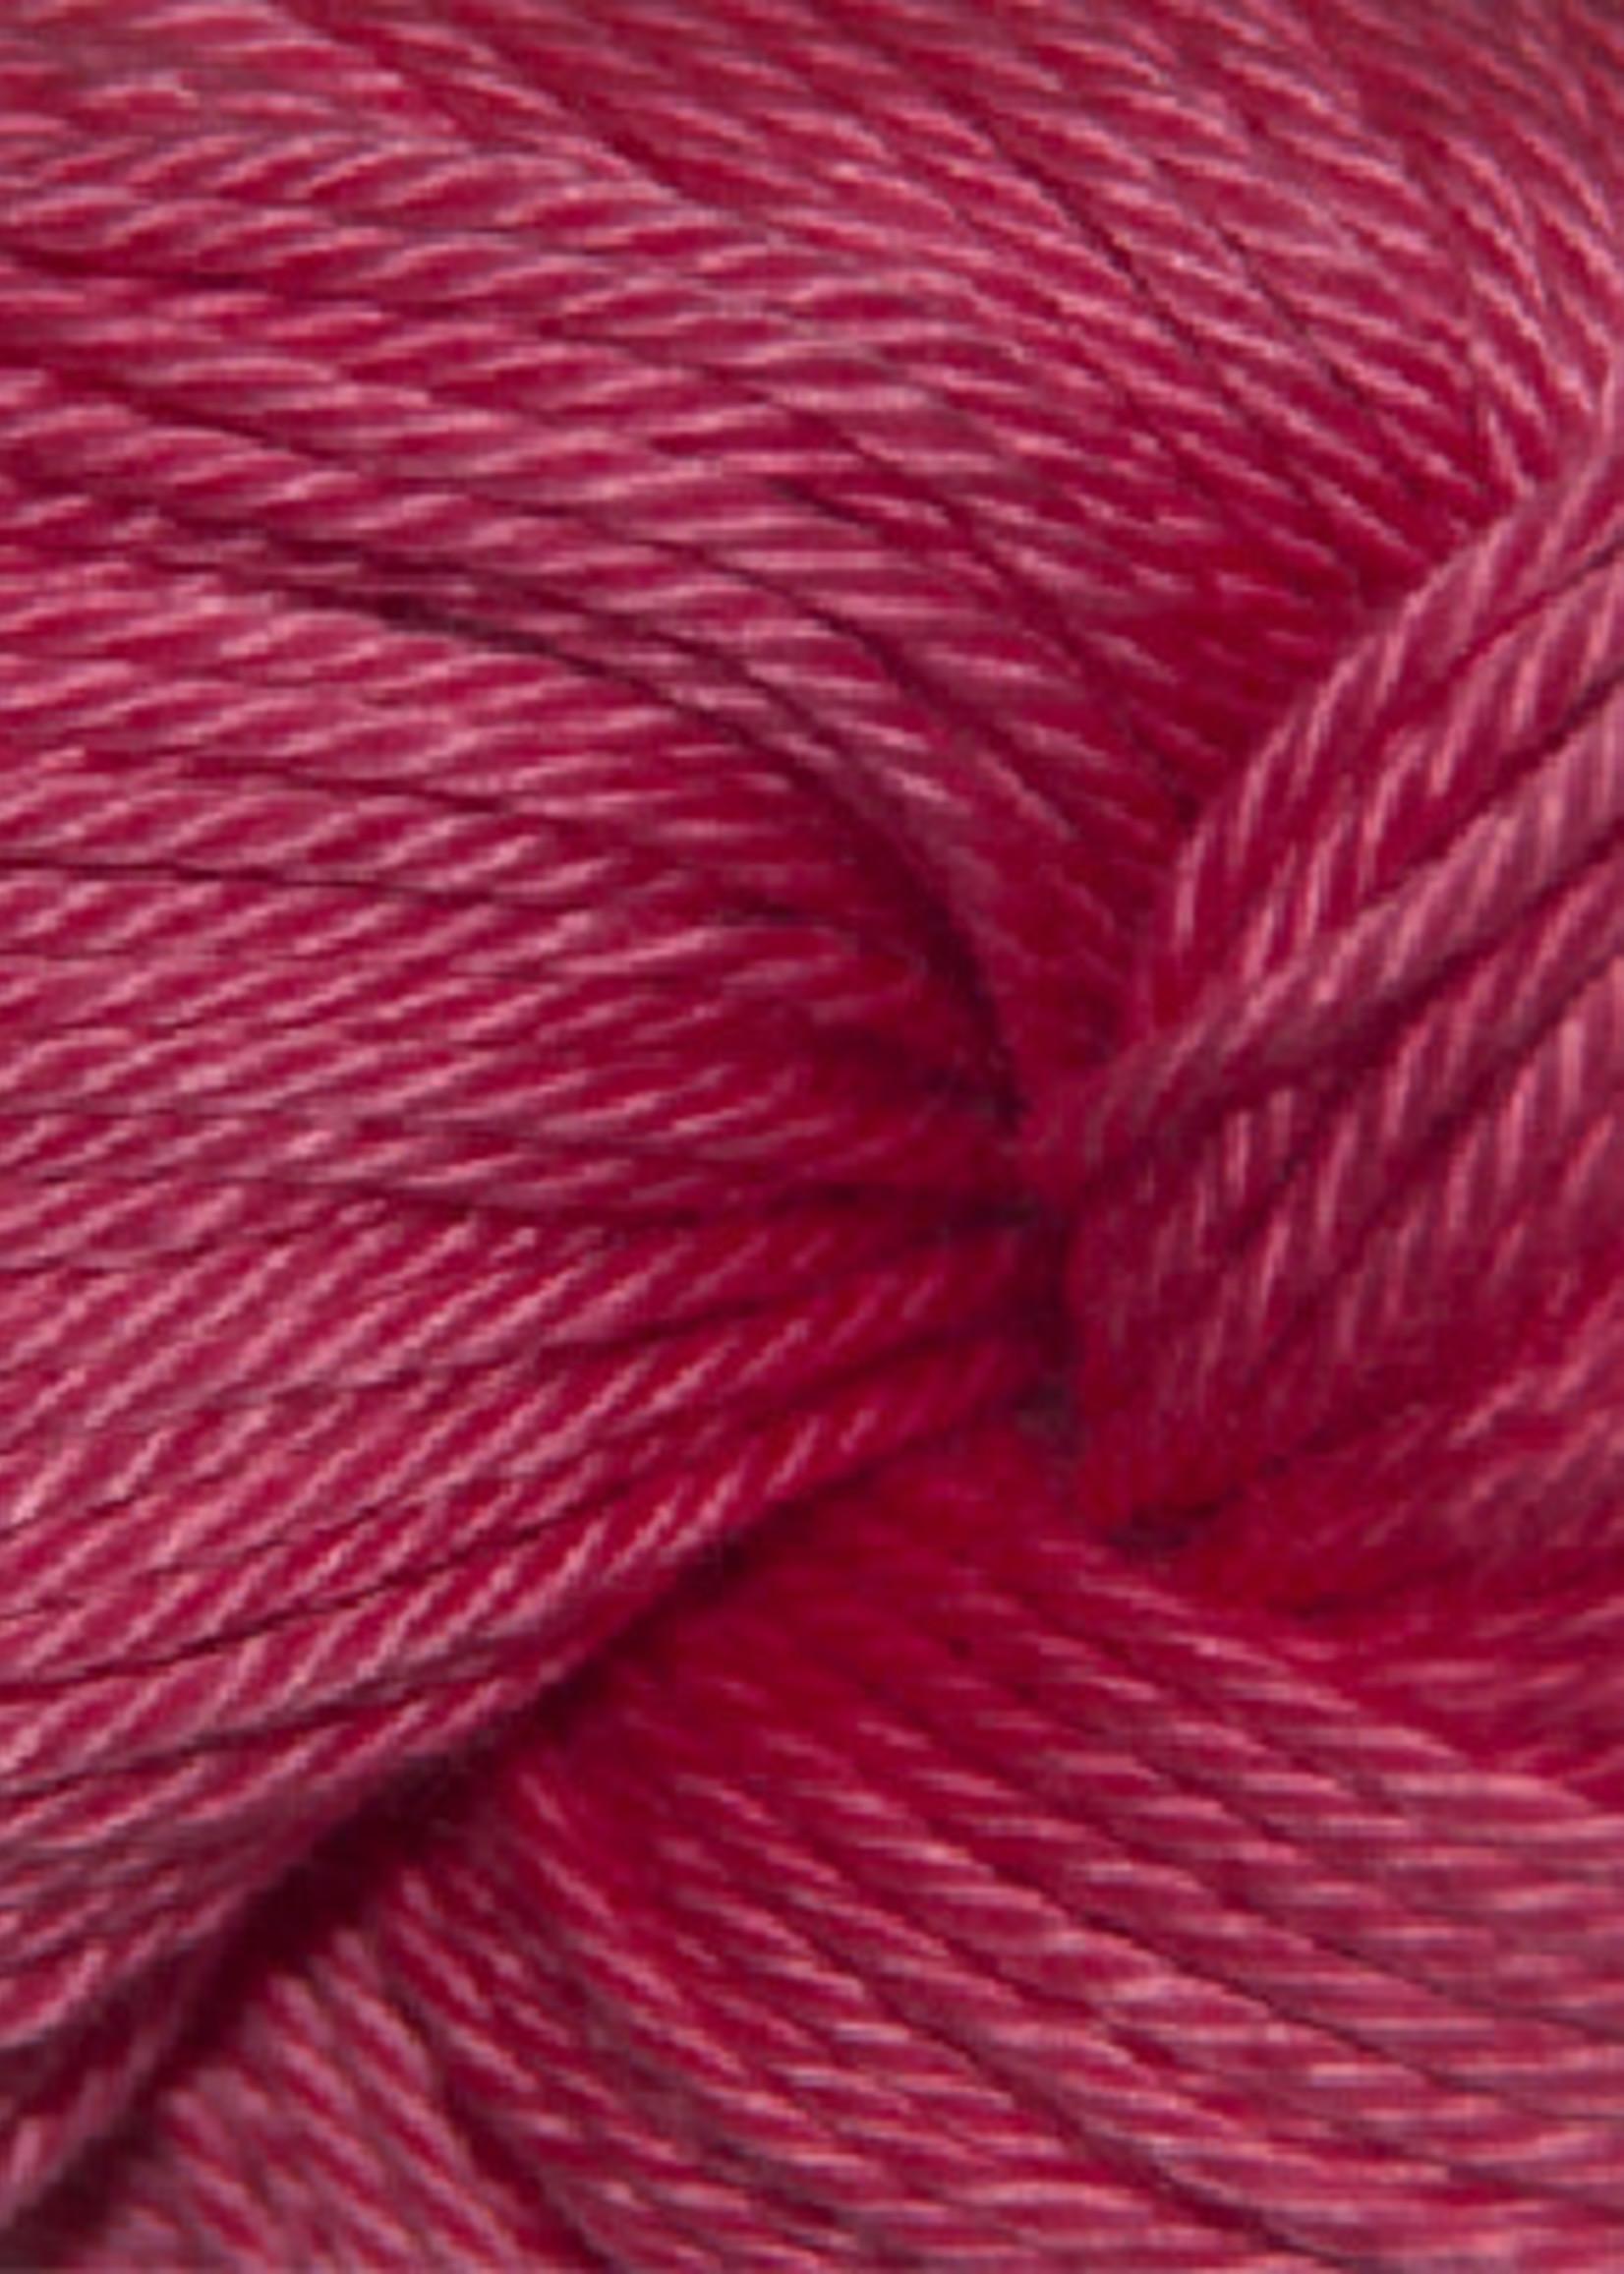 Cascade Cascade Ultra Pima Cotton #3802 Honeysuckle